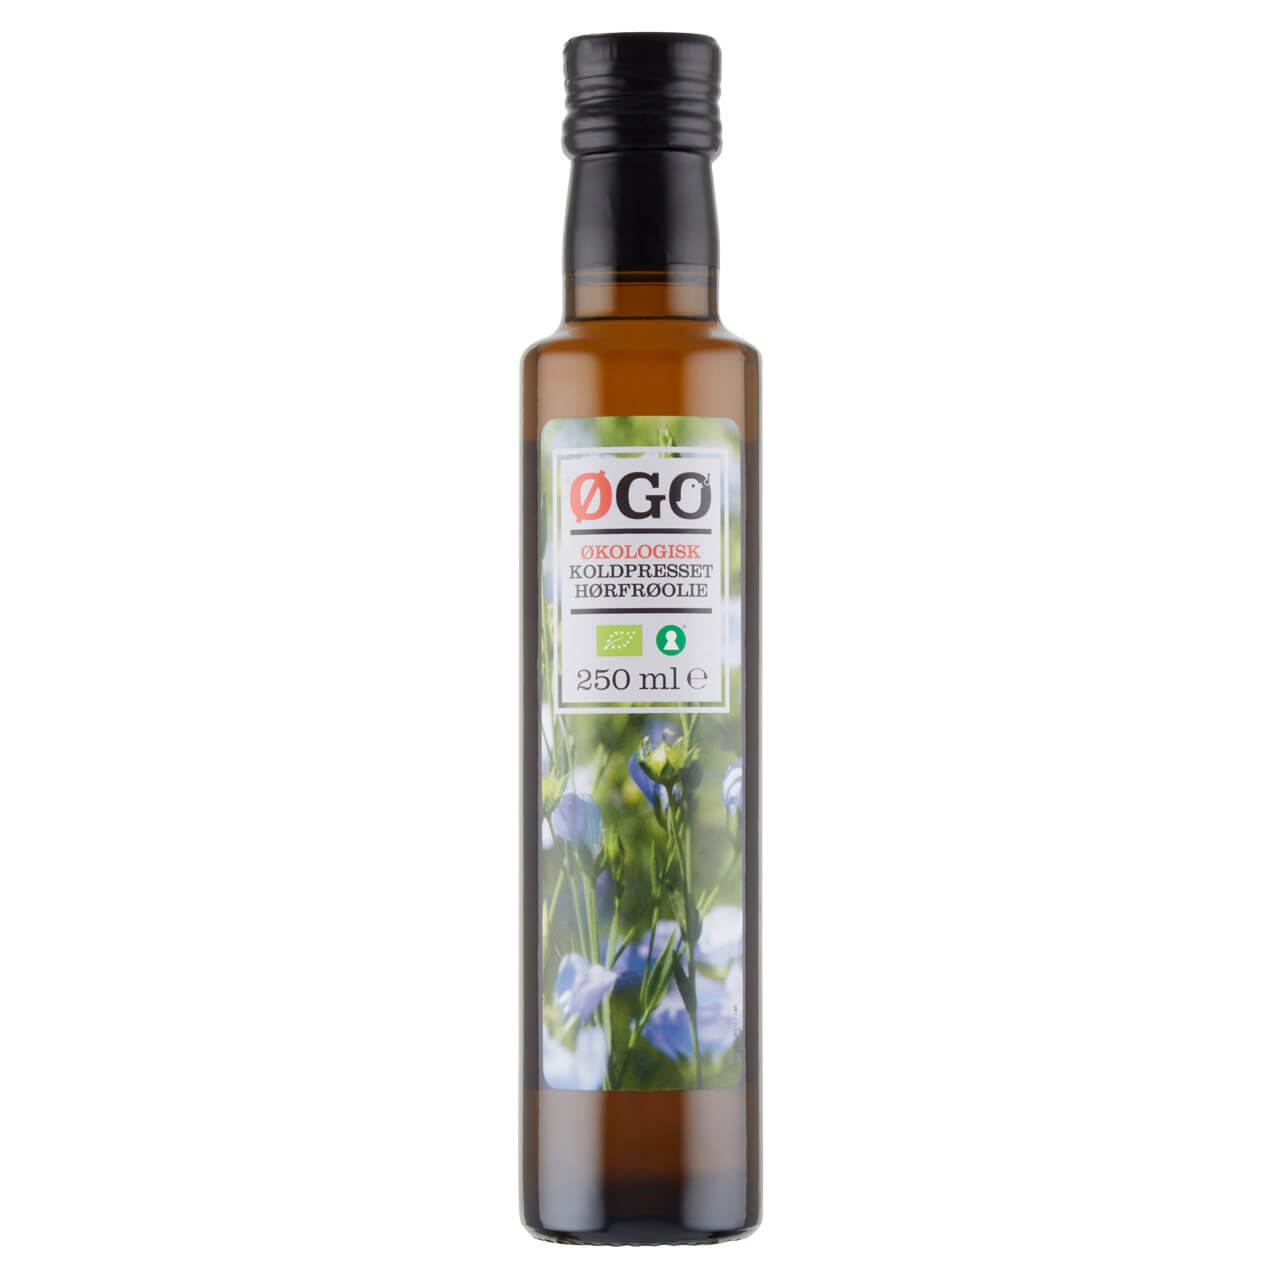 hørfrø olie fra ØGO, Netto